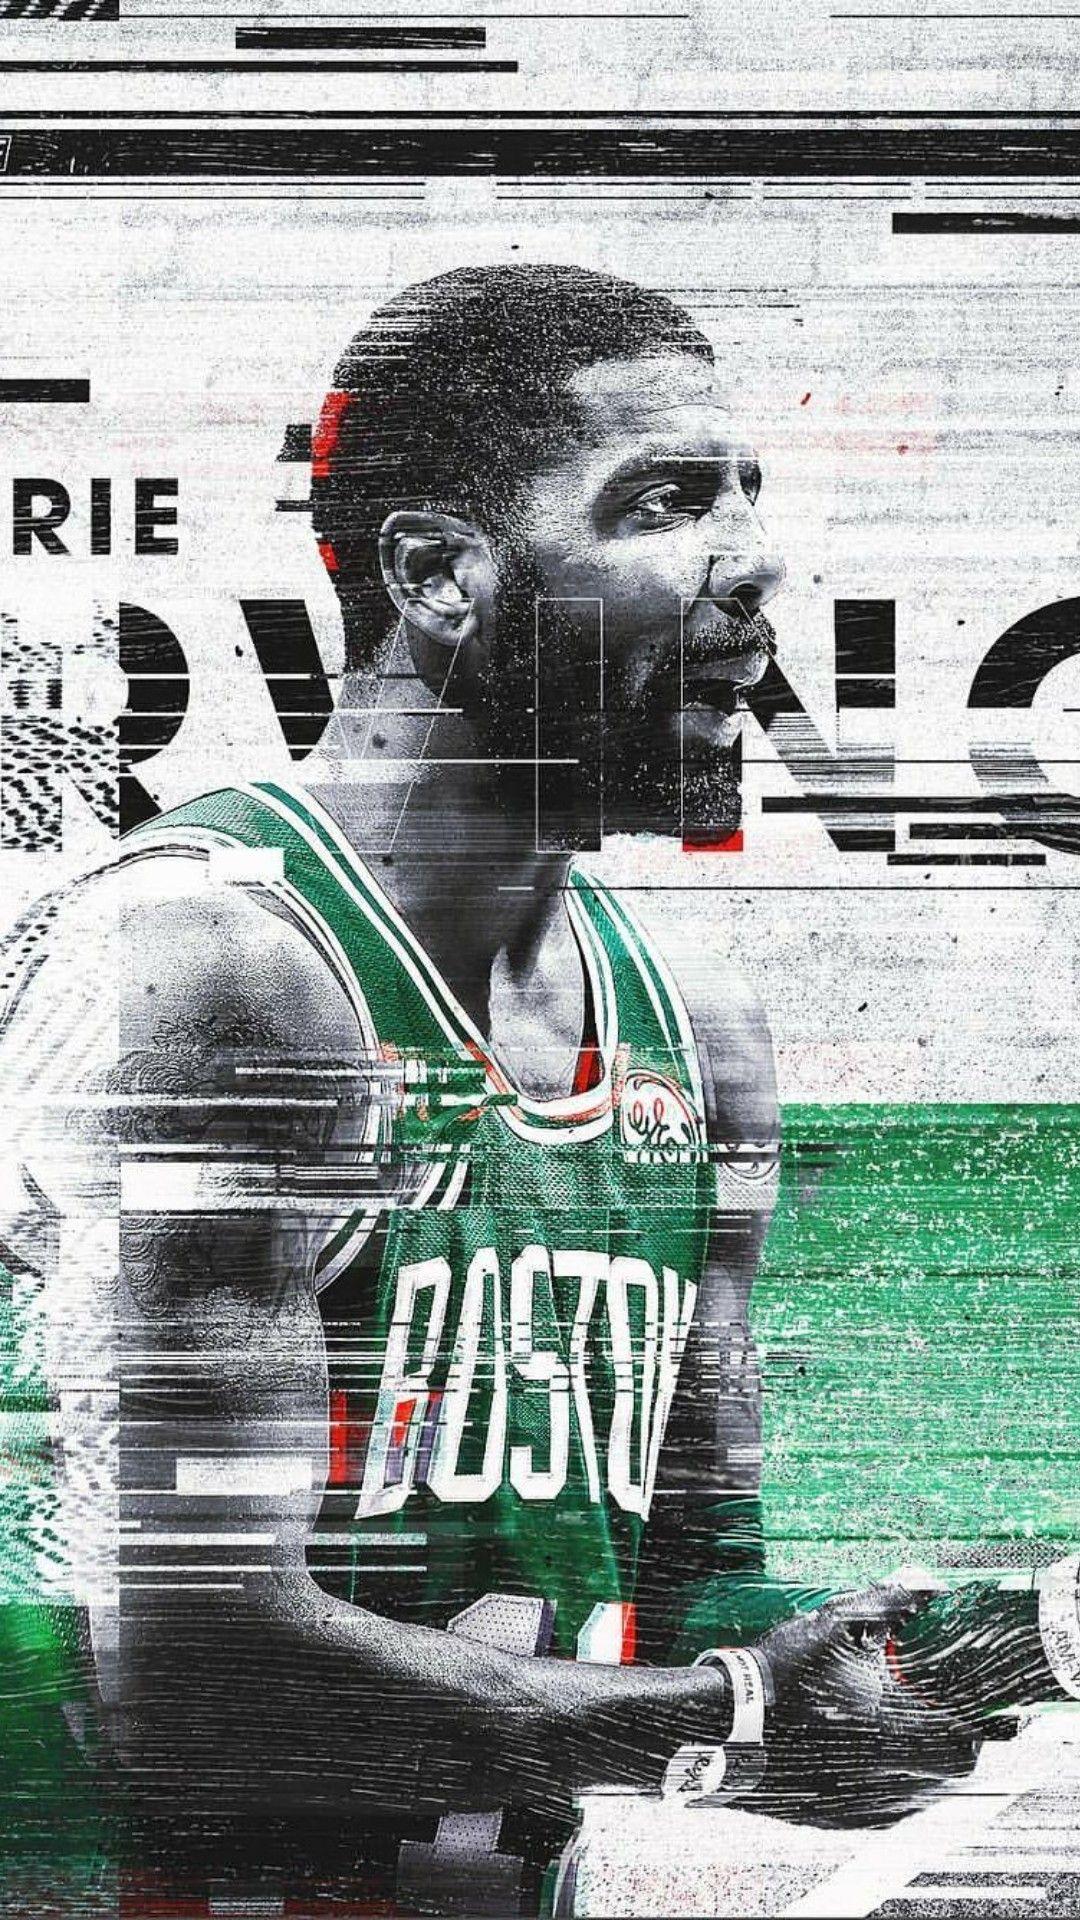 Kyrie Irving Wallpaper スポーツグラフィック バスケットボール選手 スポーツ ポスター